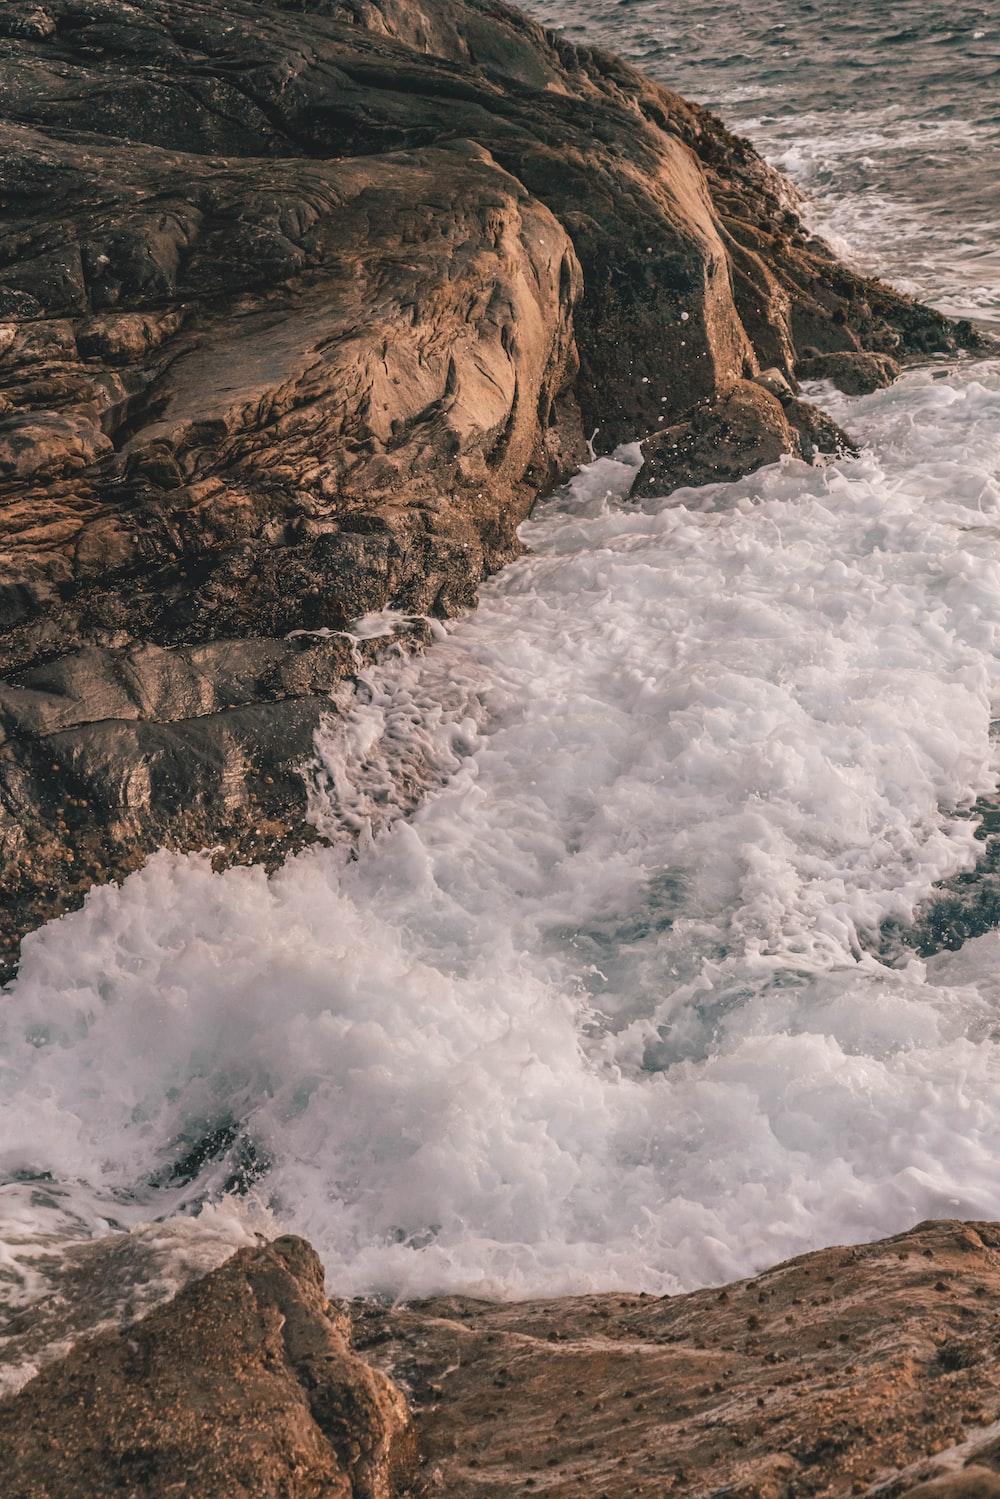 sea wave crashing on rock boulders